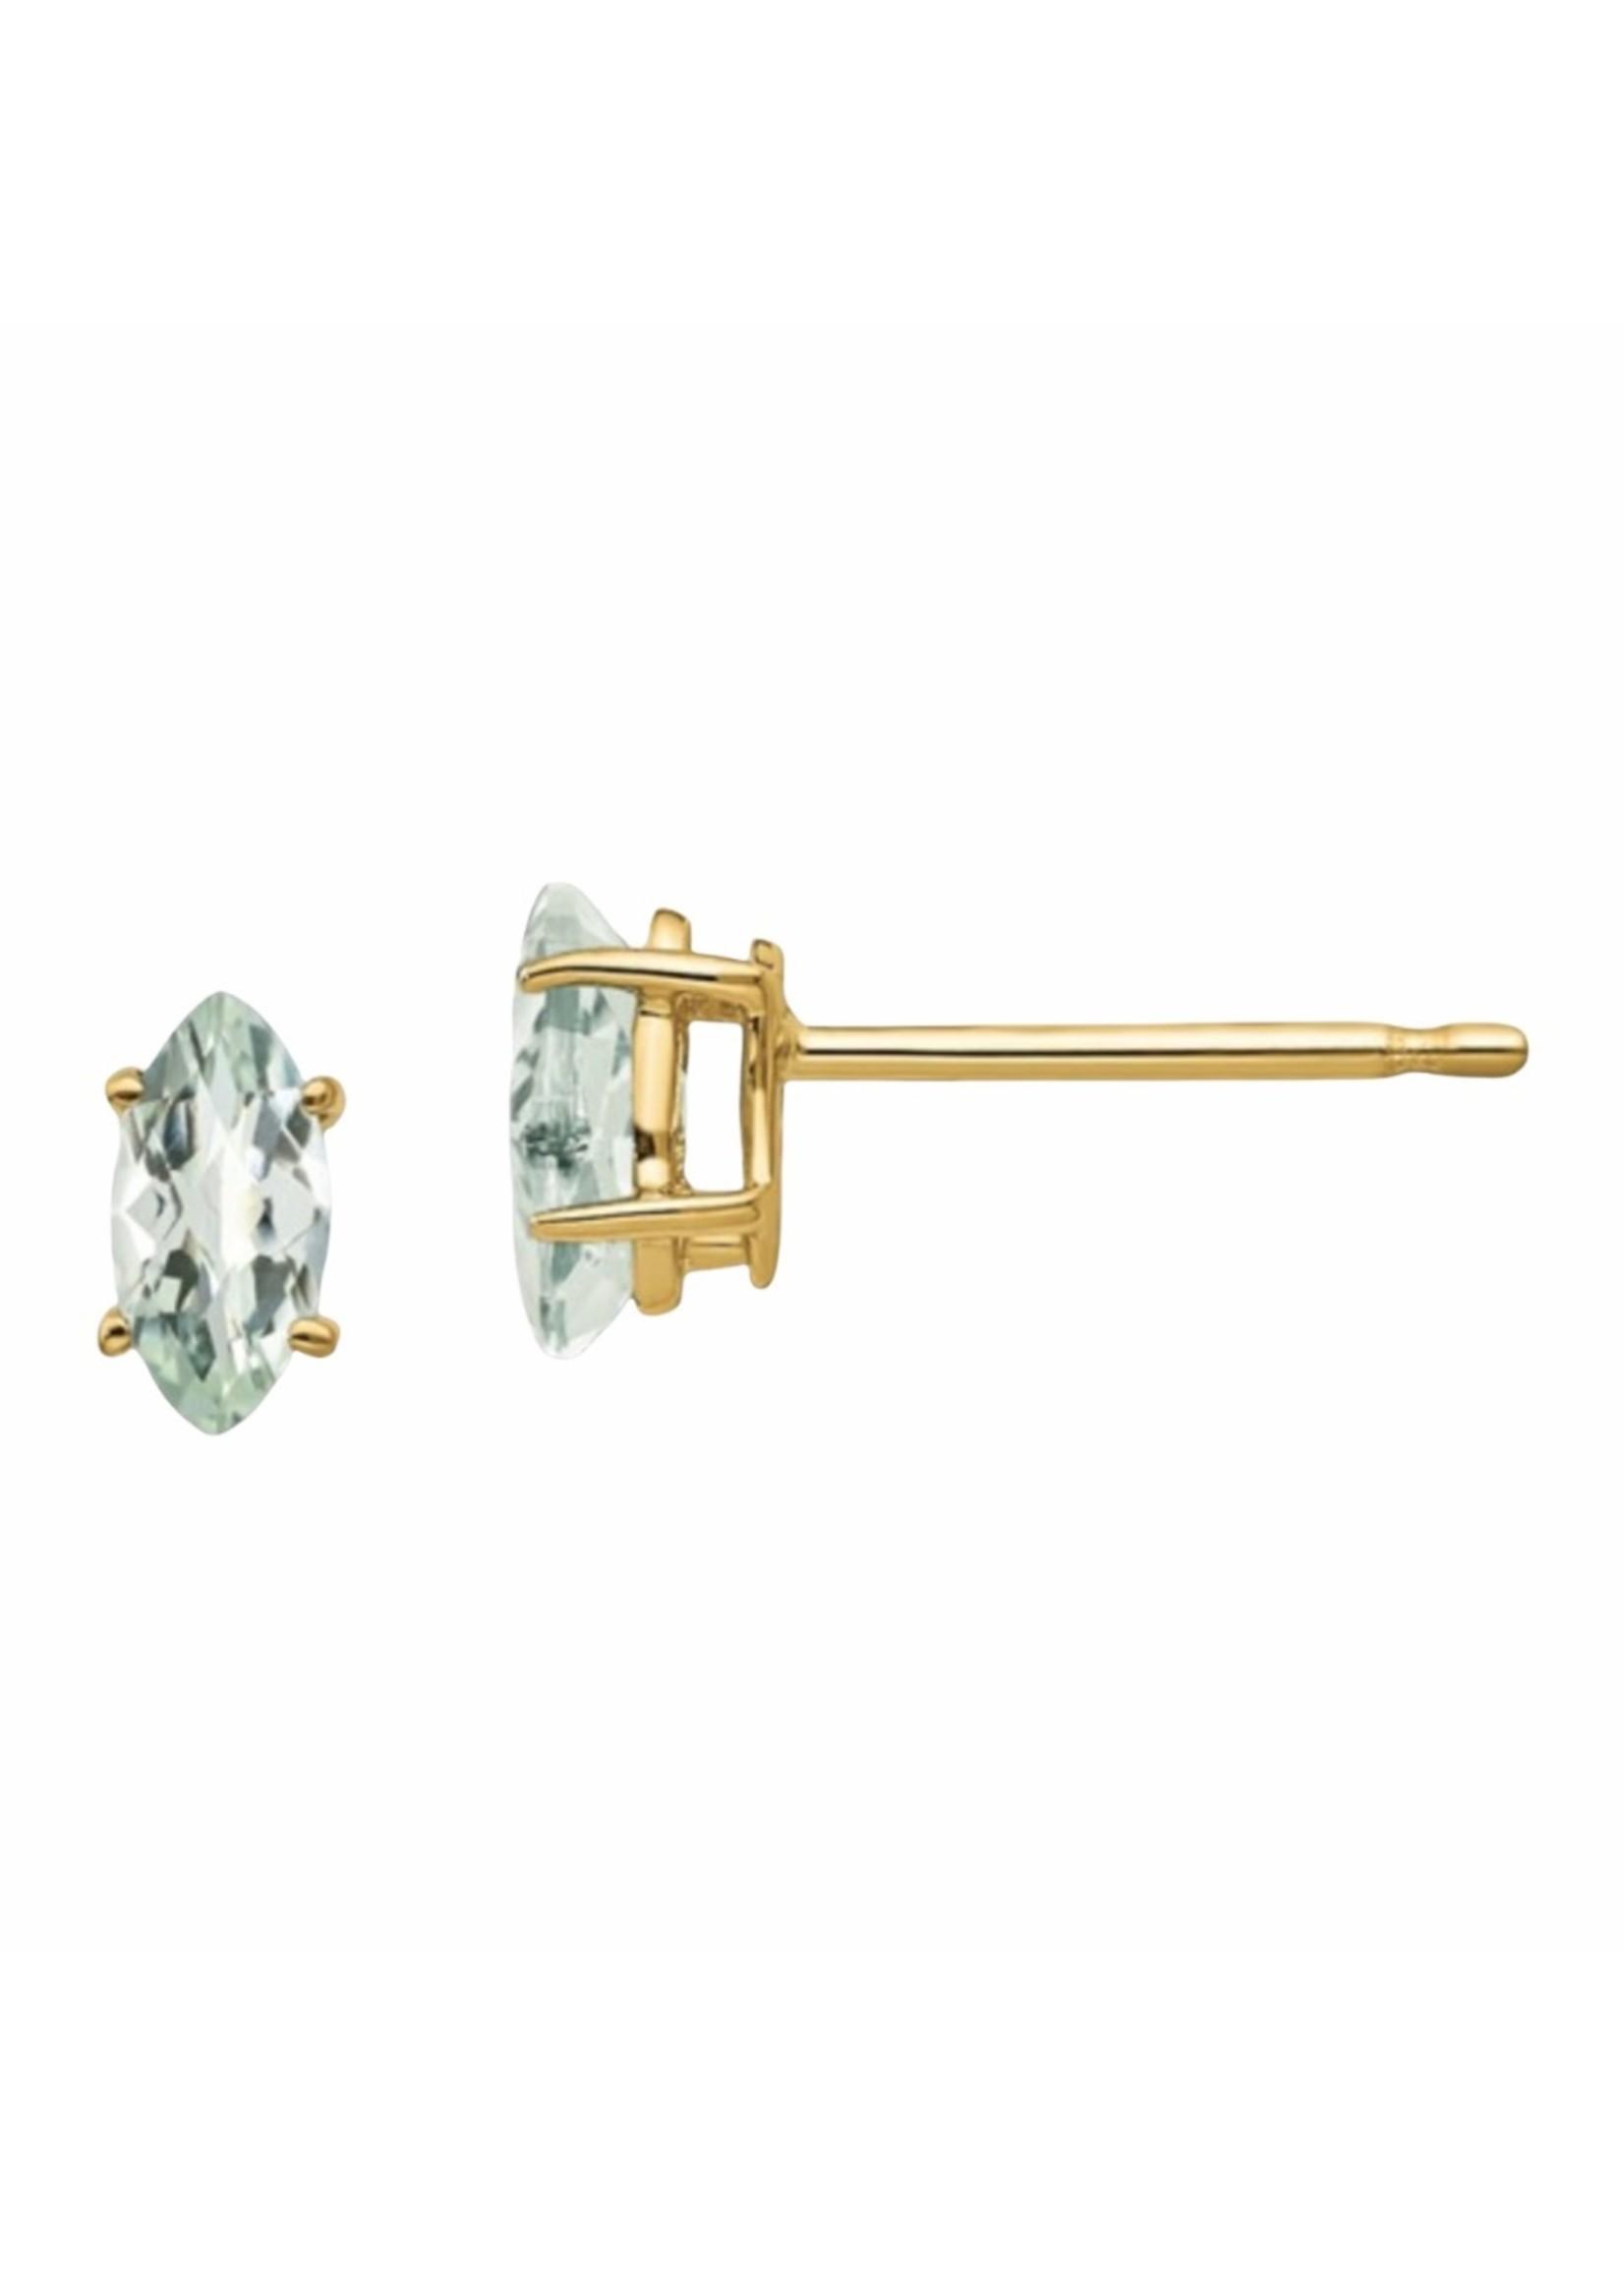 Jill Alberts Green Quartz Stud Earrings